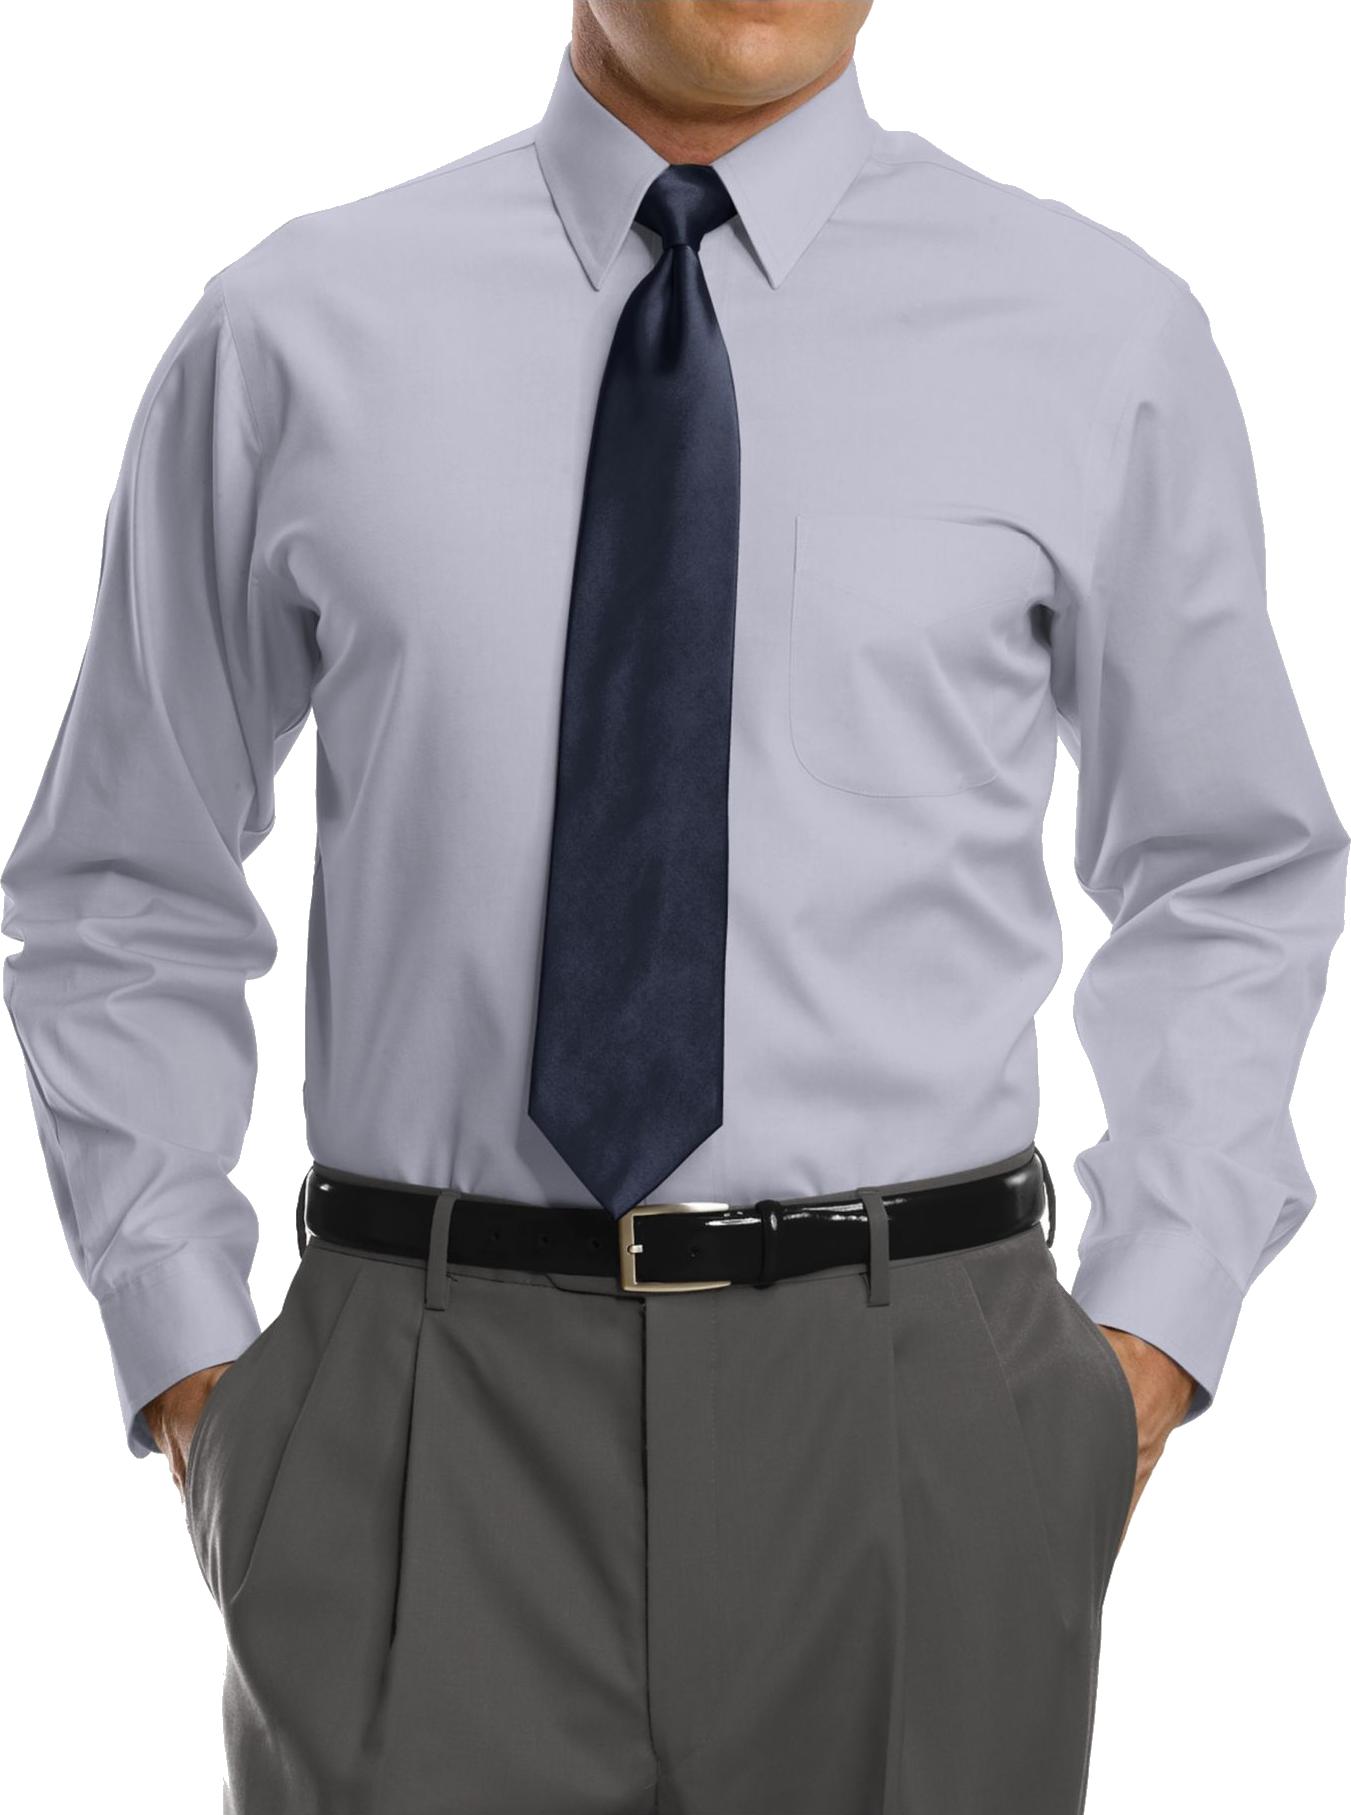 Men Clothes Png - Dress Shirt, Transparent background PNG HD thumbnail